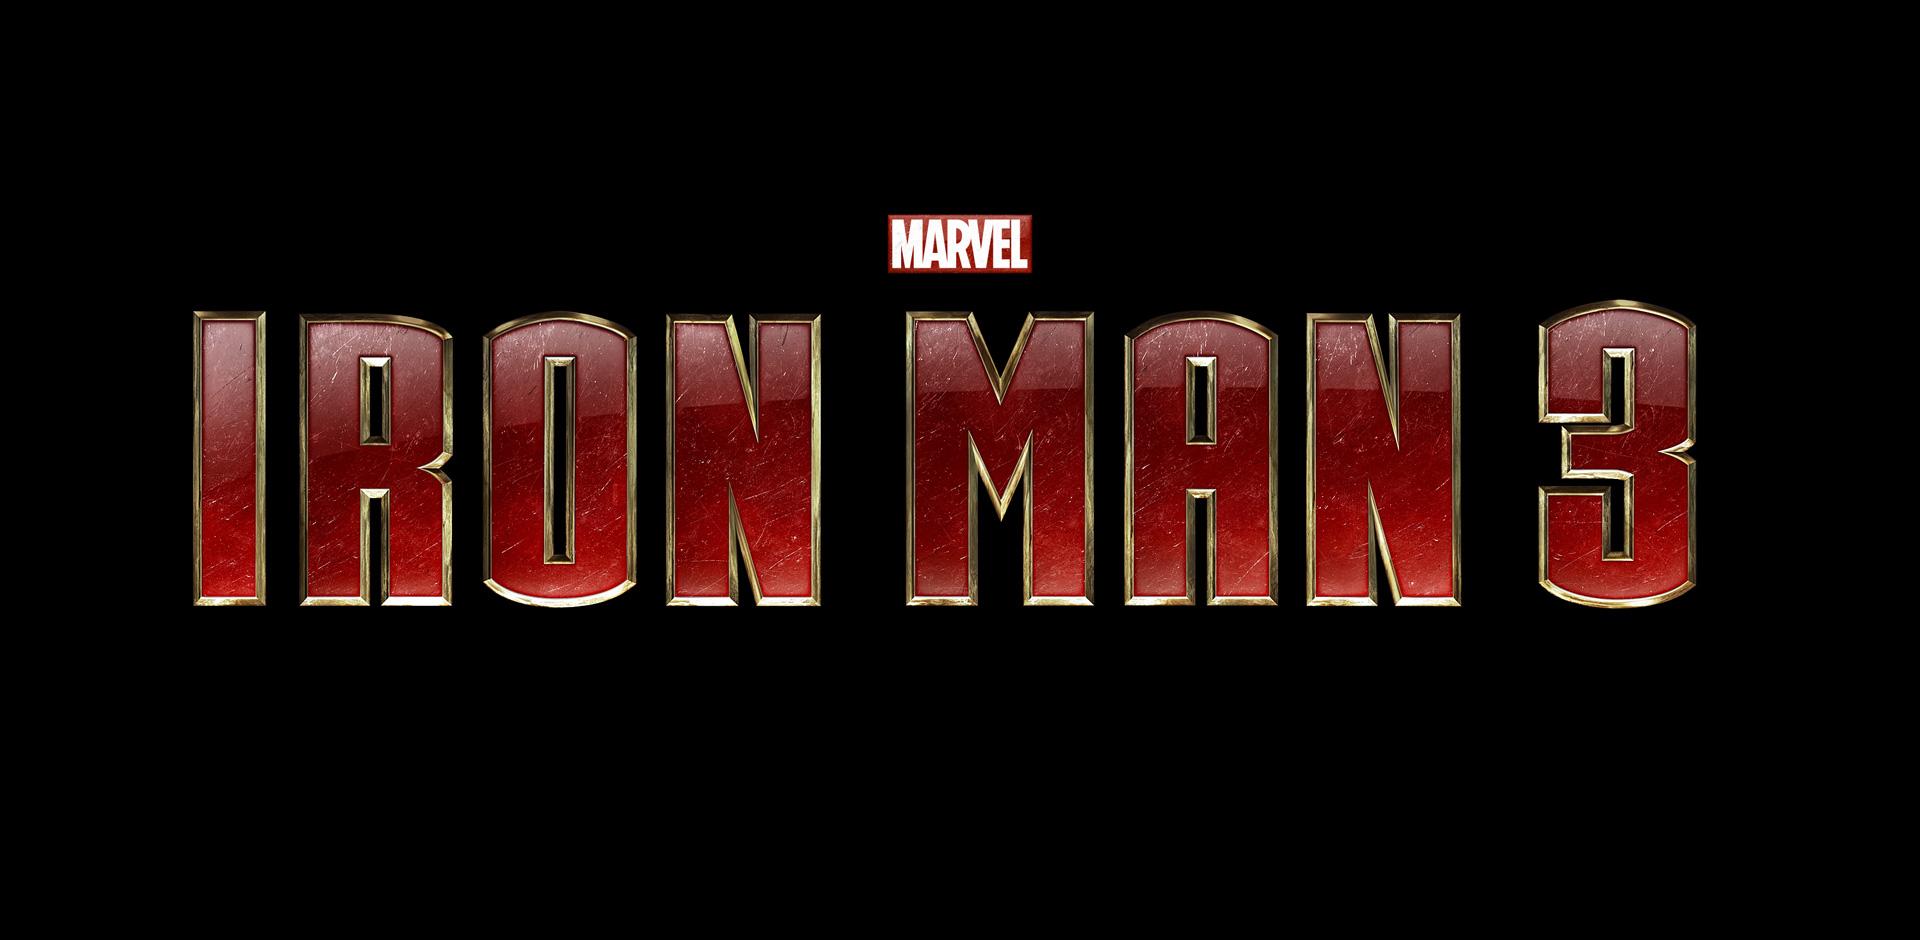 Marvel Iron Man Logos